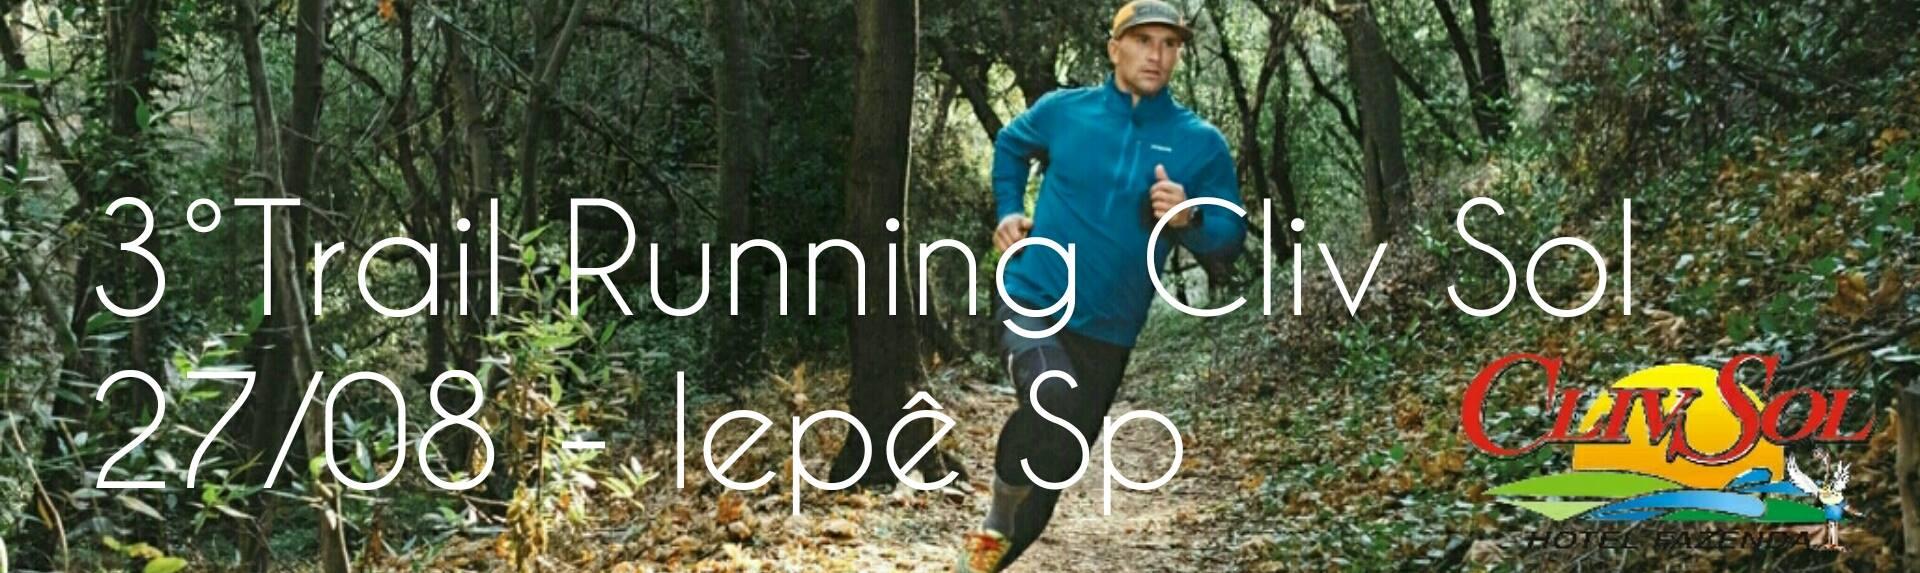 3º Trail Running Cliv Sol